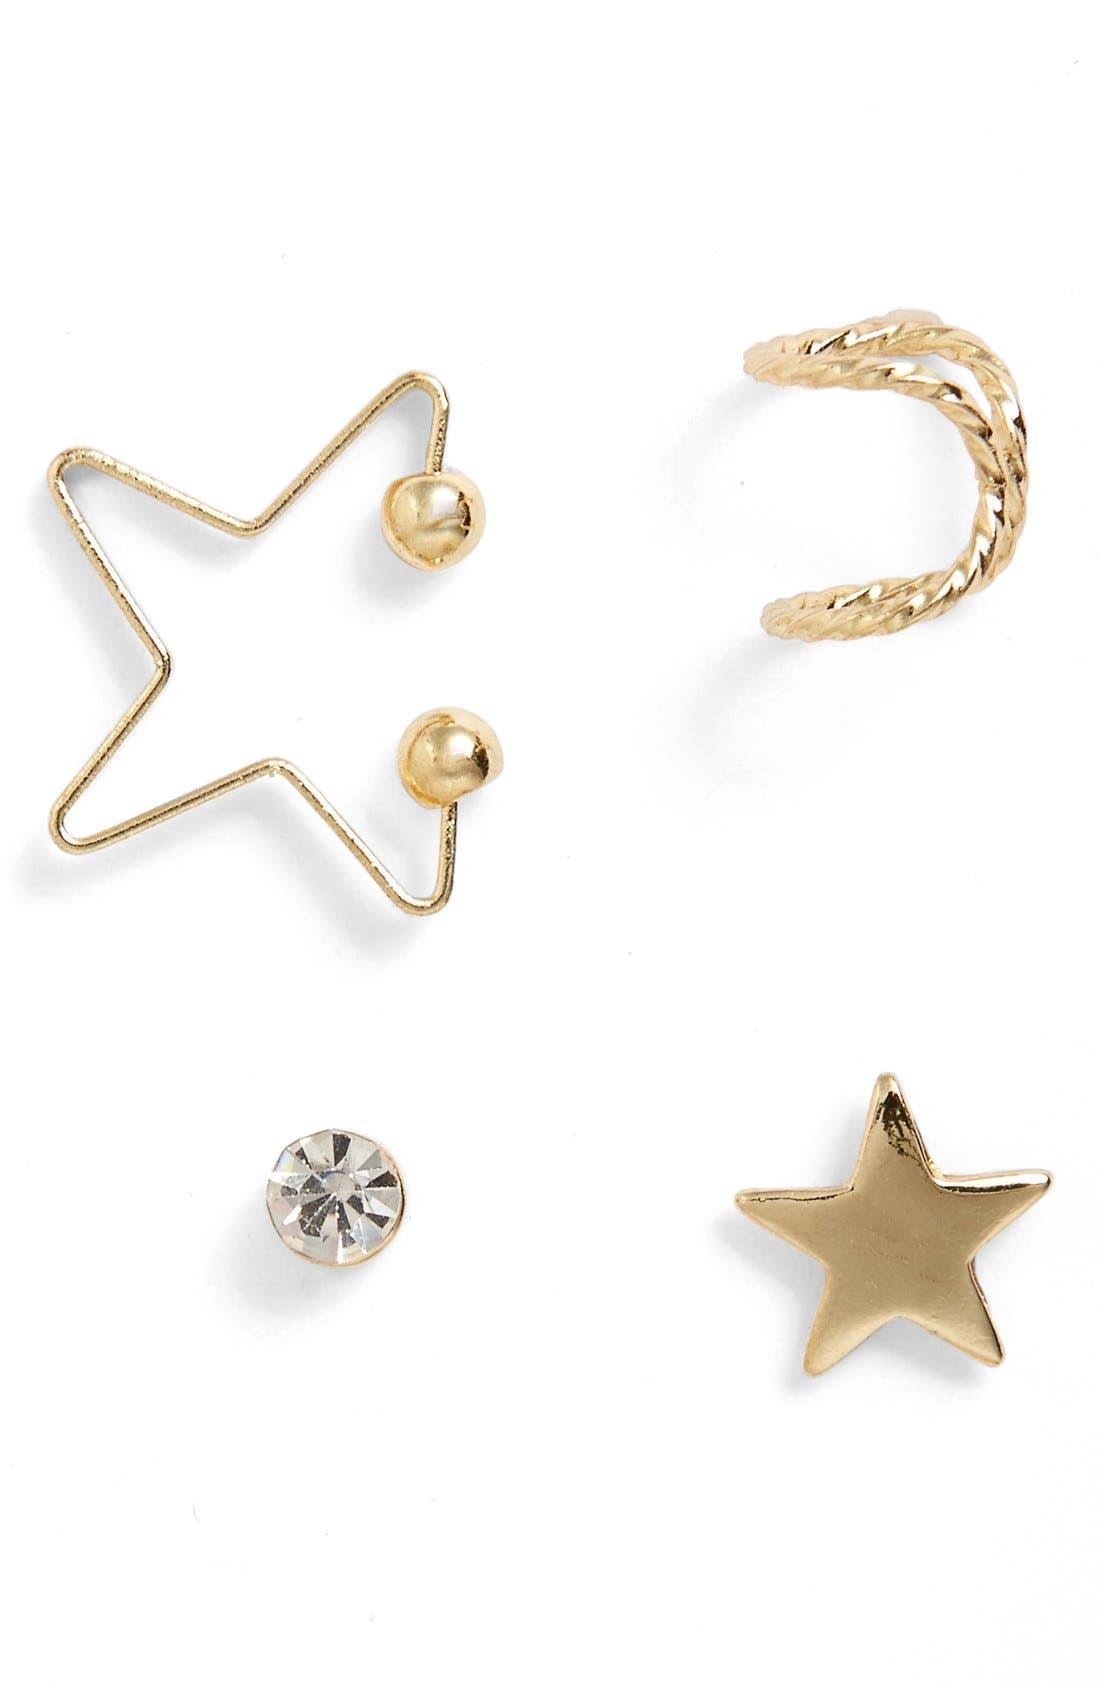 Main Image - Topshop Star Ear Cuff & Earrings (Set of 4)